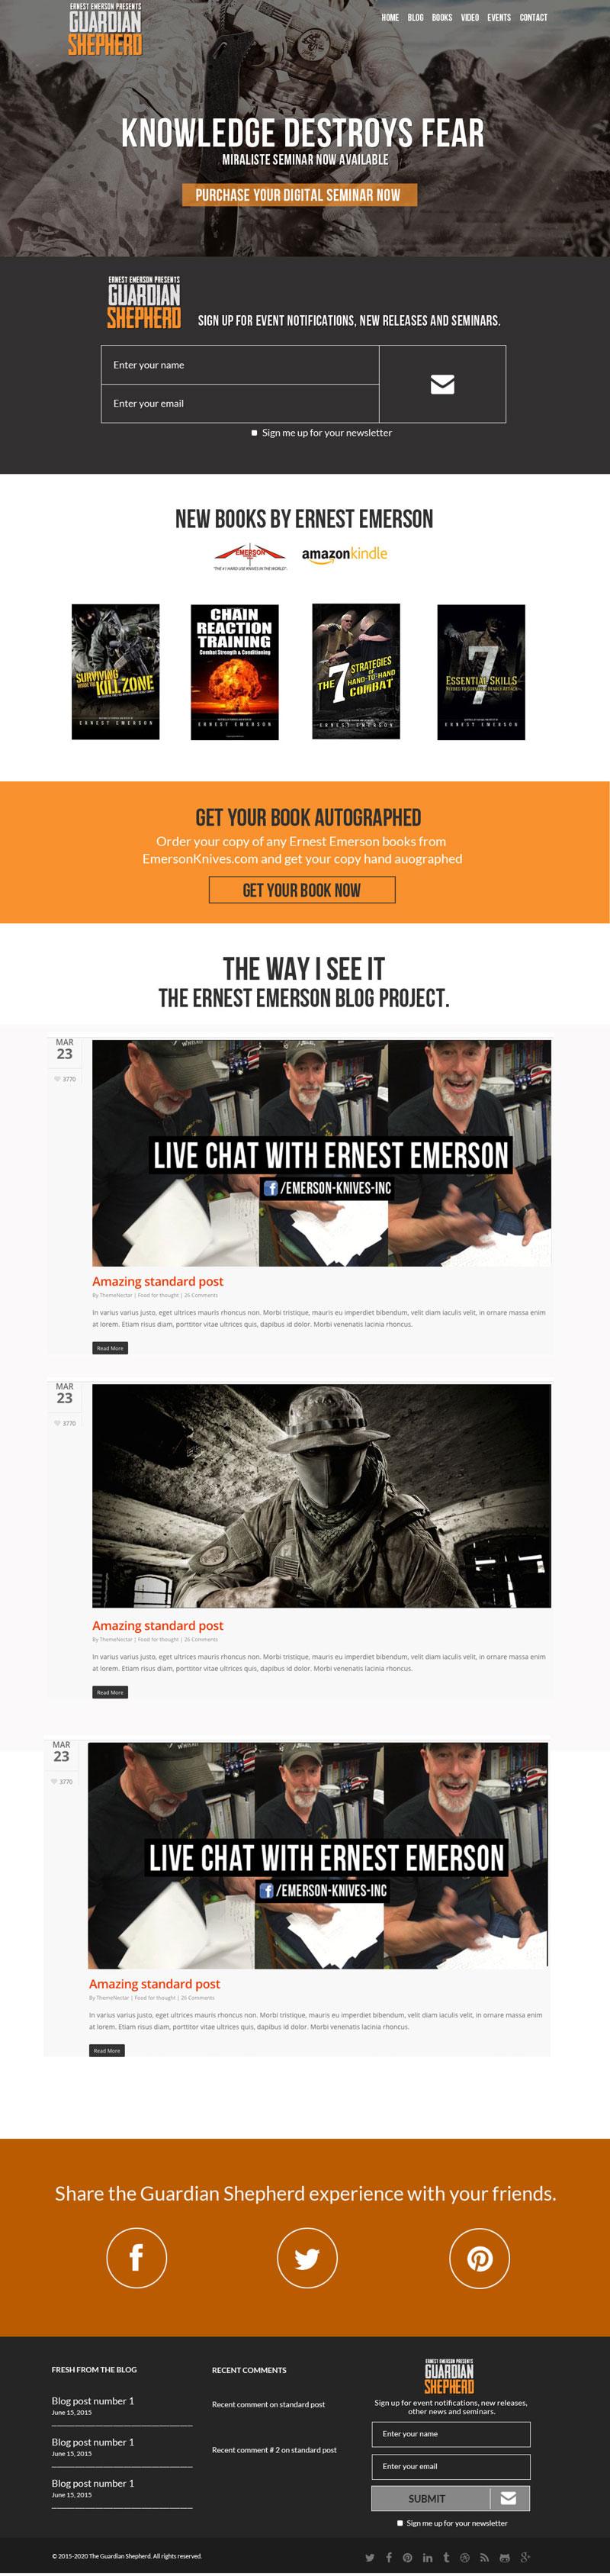 ernest-emerson-guardian-shepherd-blog-screen